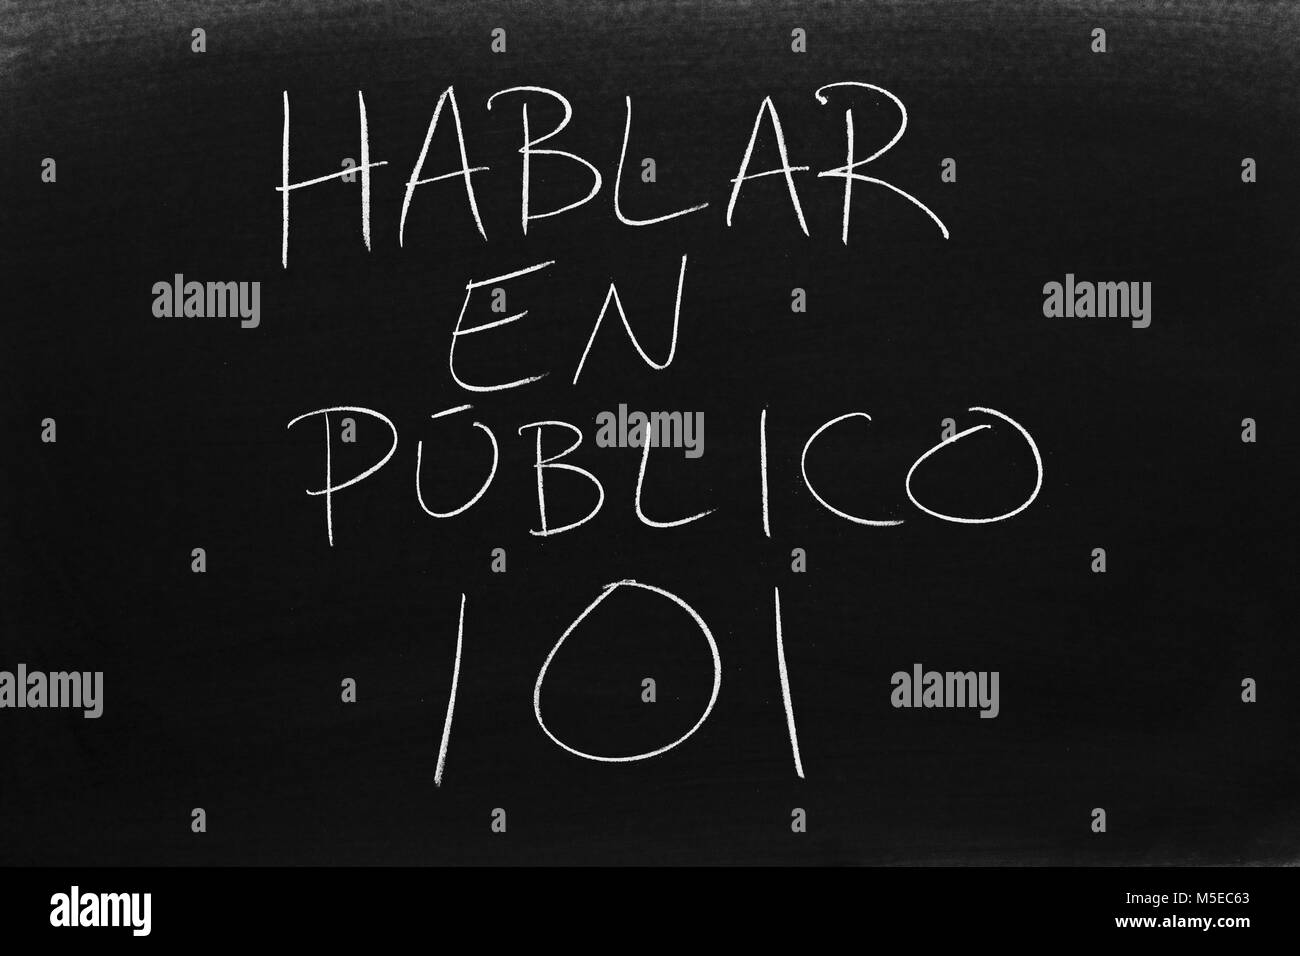 The words Hablar En Público 101 on a blackboard in chalk - Stock Image